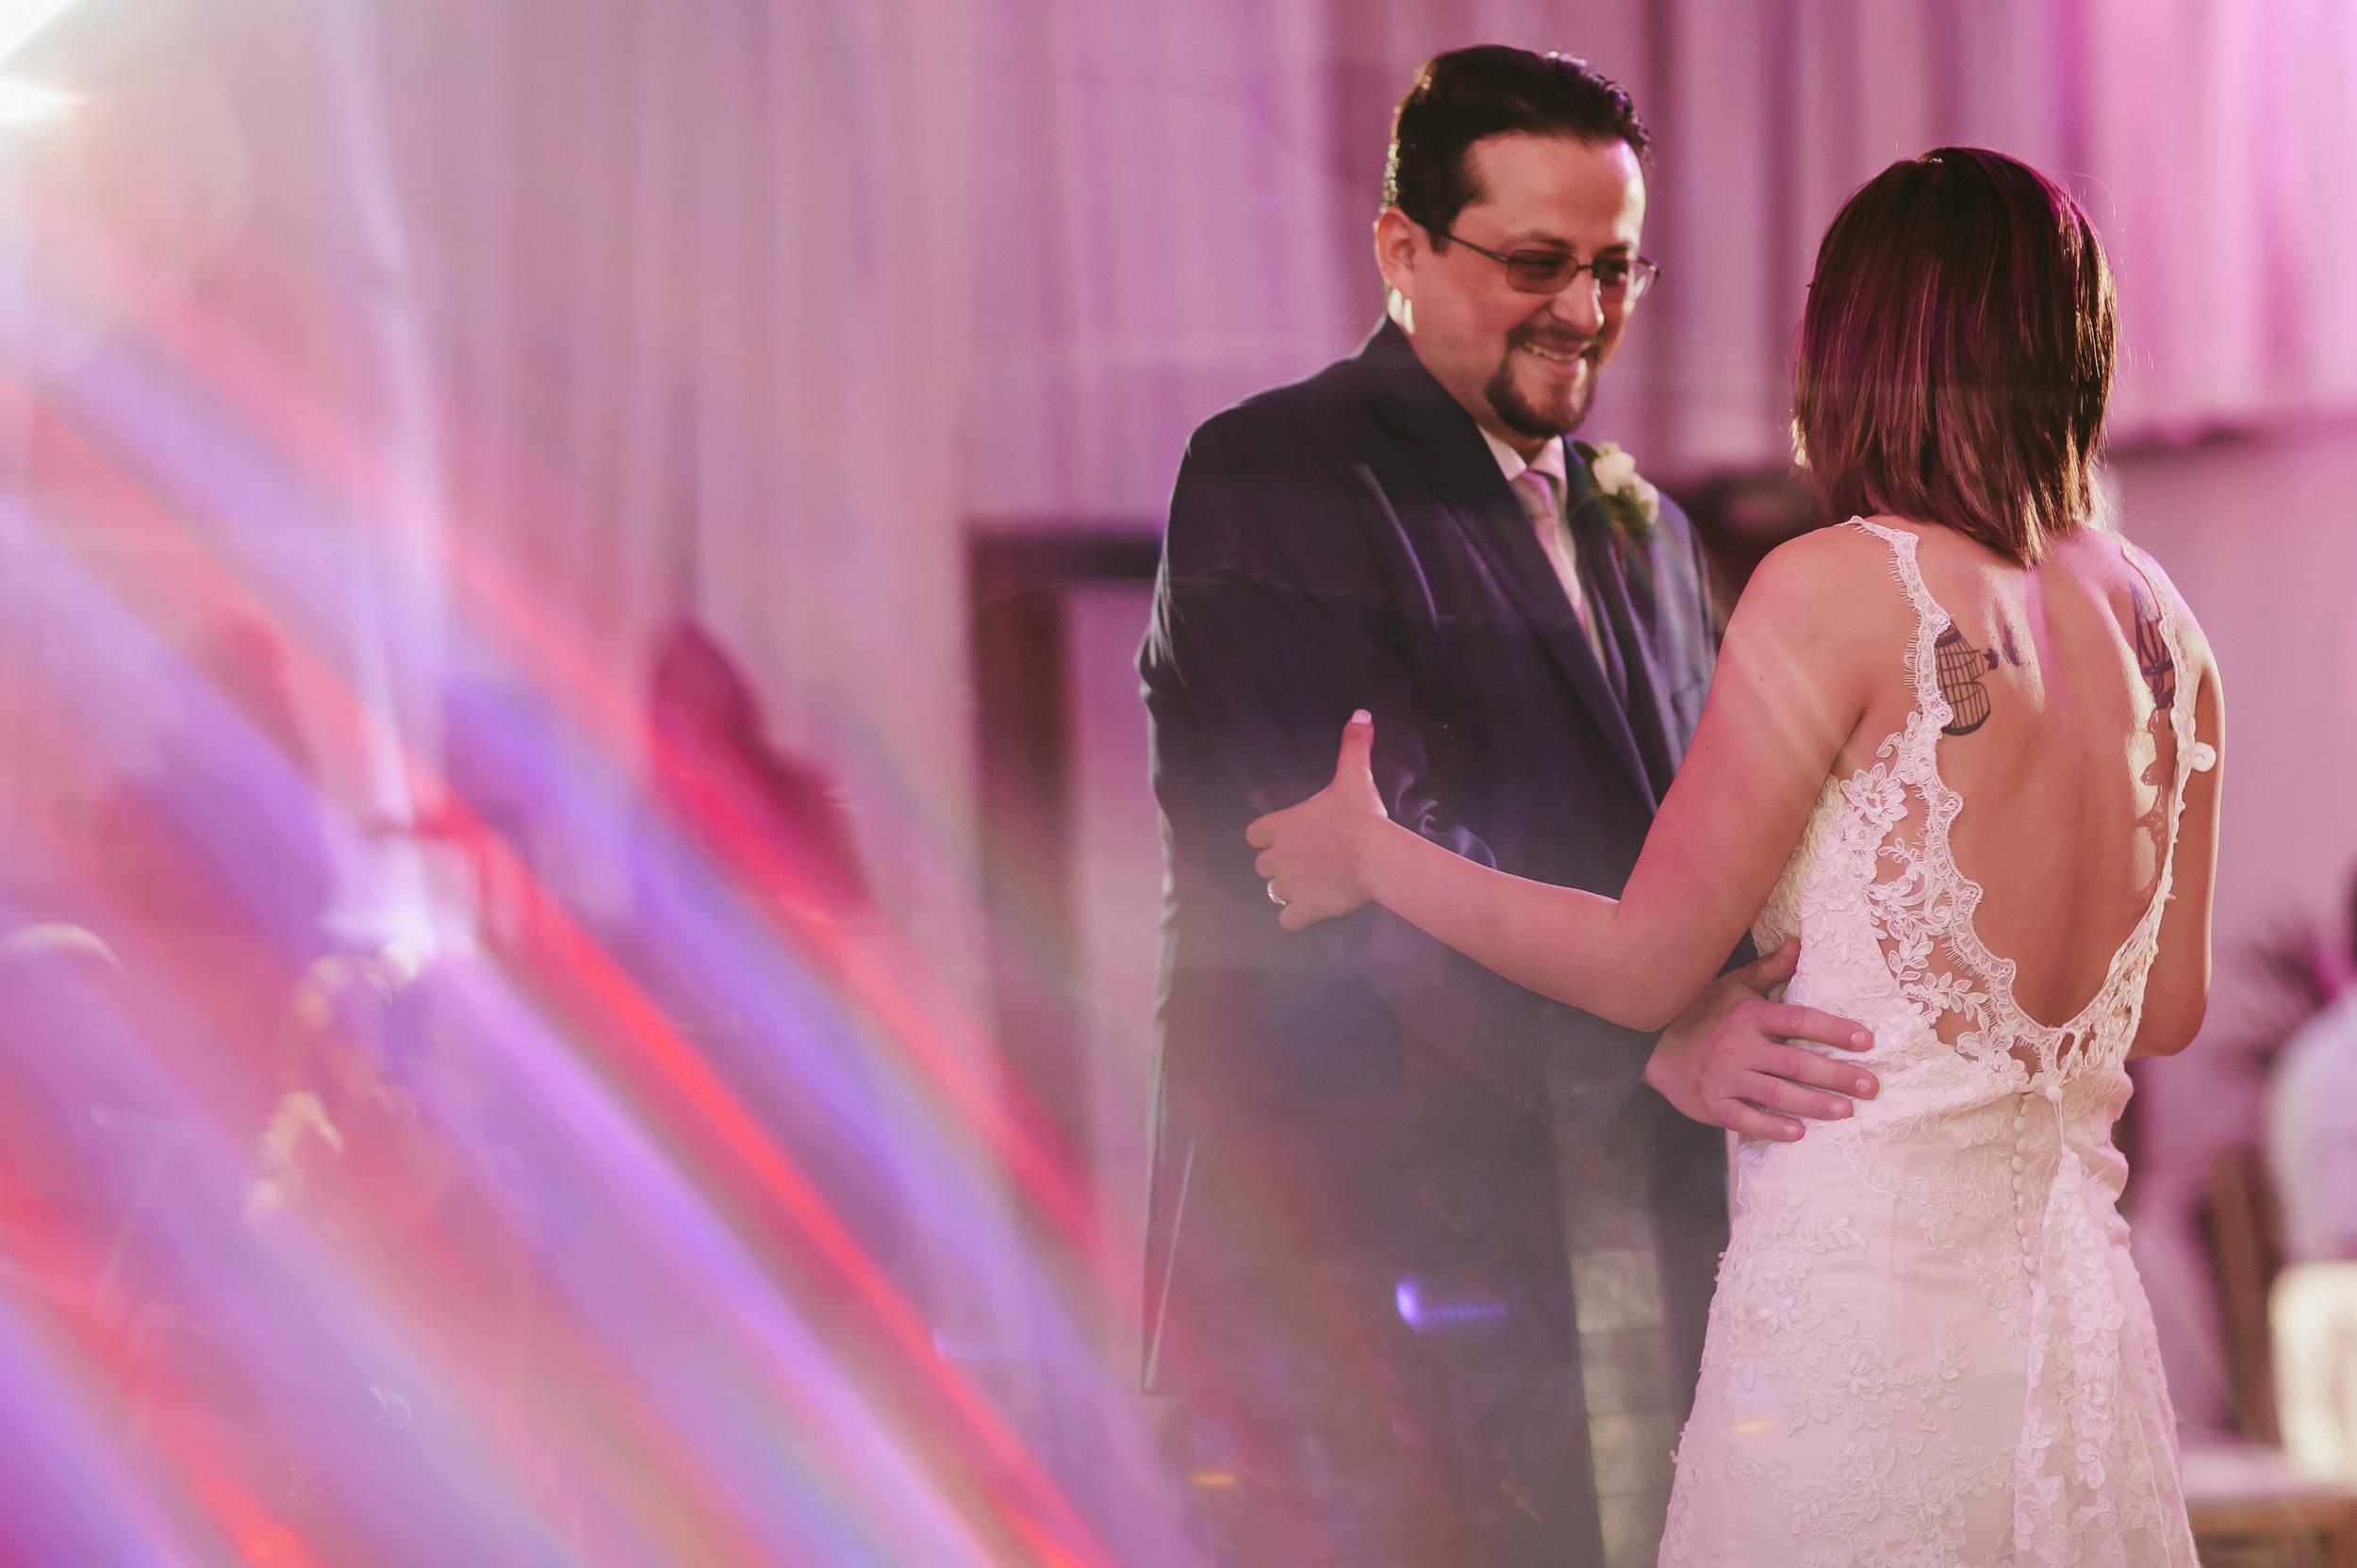 father_daughter_dance_wedding_tiny_house_photo.jpg